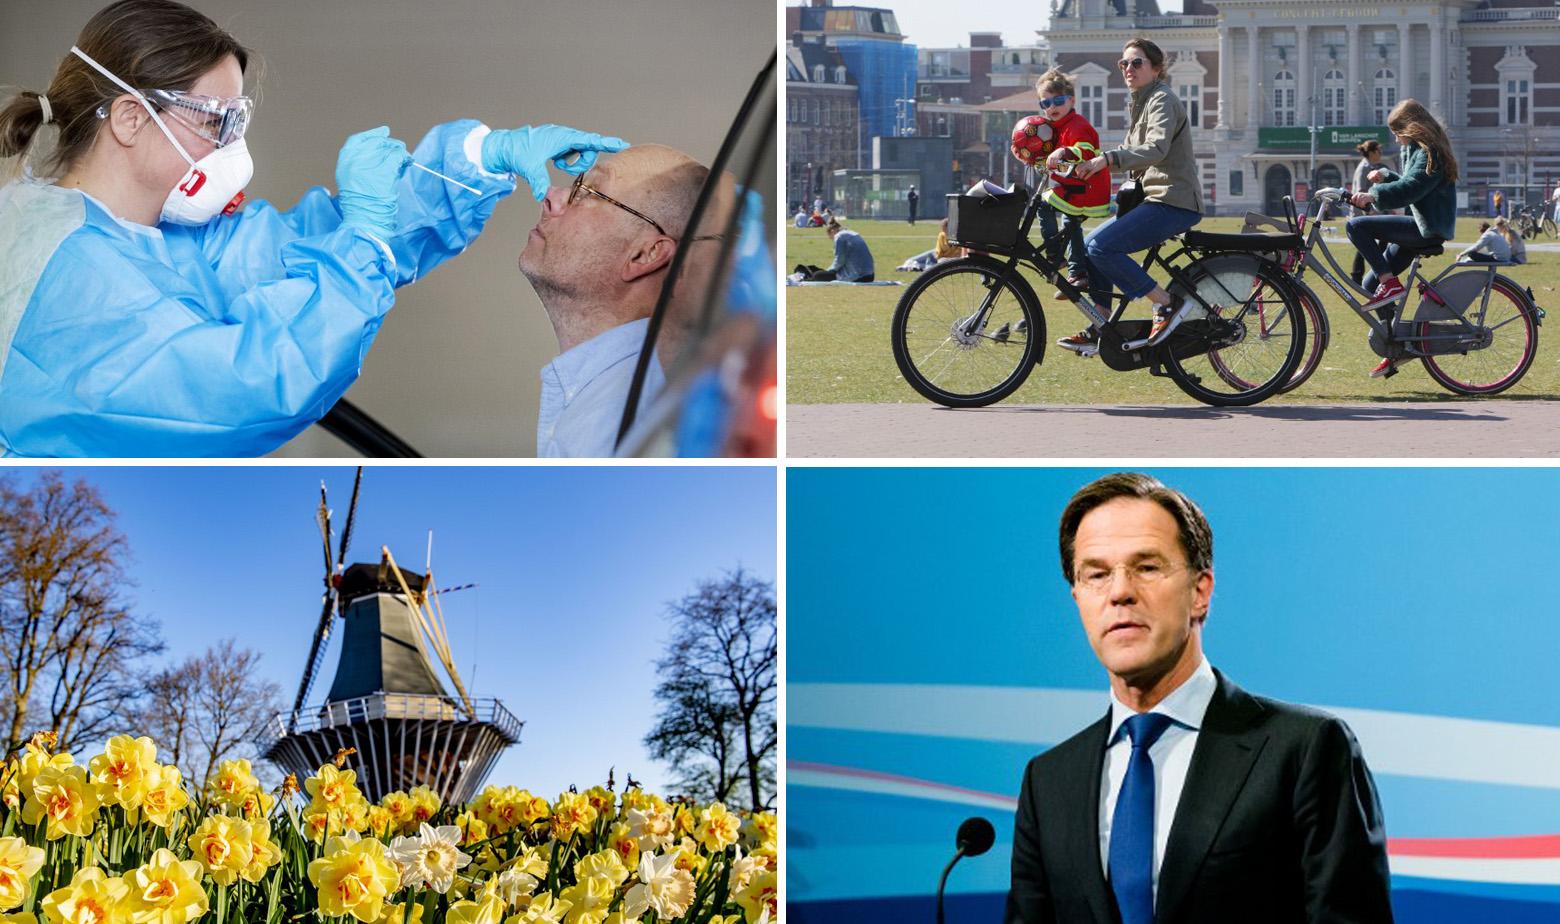 Prizori iz Nizozemske i Mark Rutte dolje desno